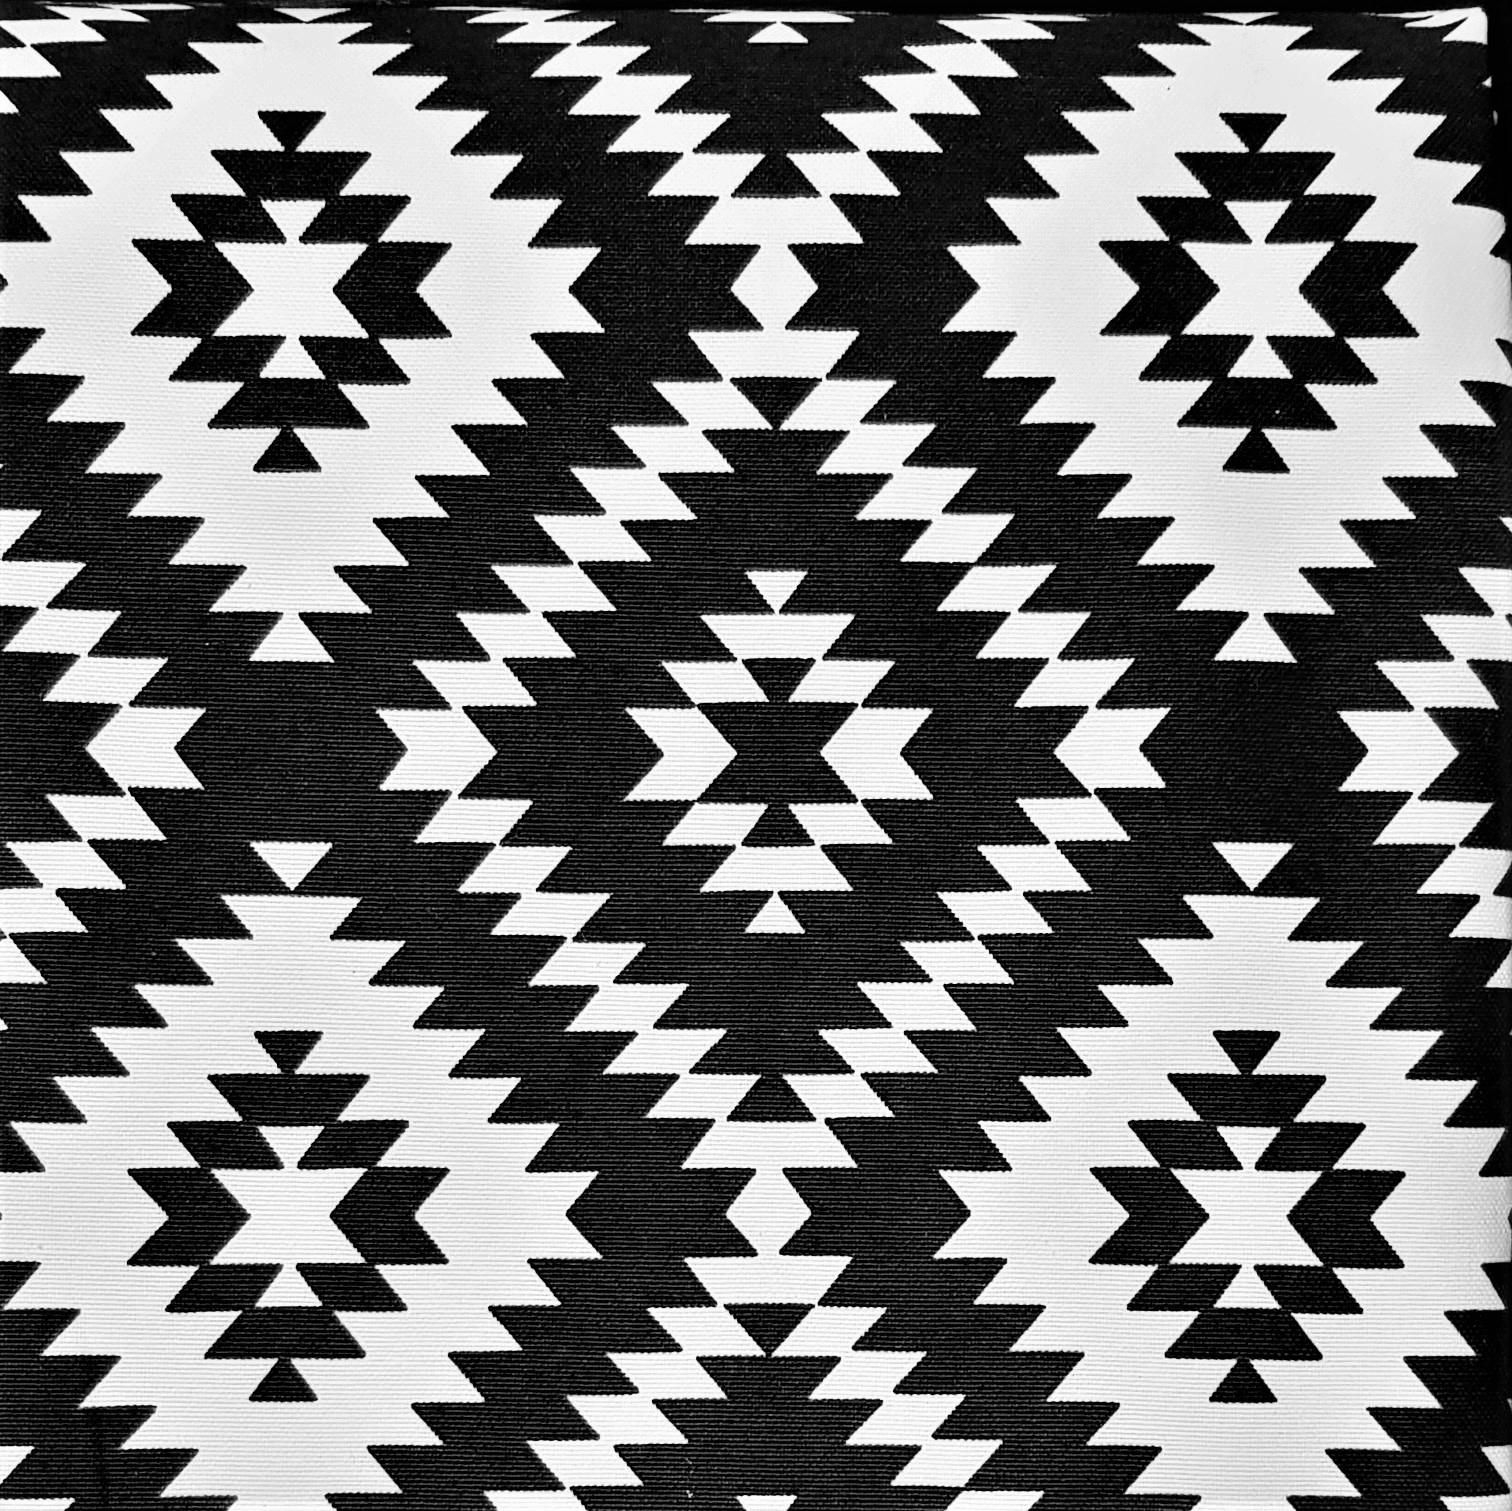 Mantel ÉTNICONEGRO Rectangular 1,5x2,4m [enstockpara envíooretiro]